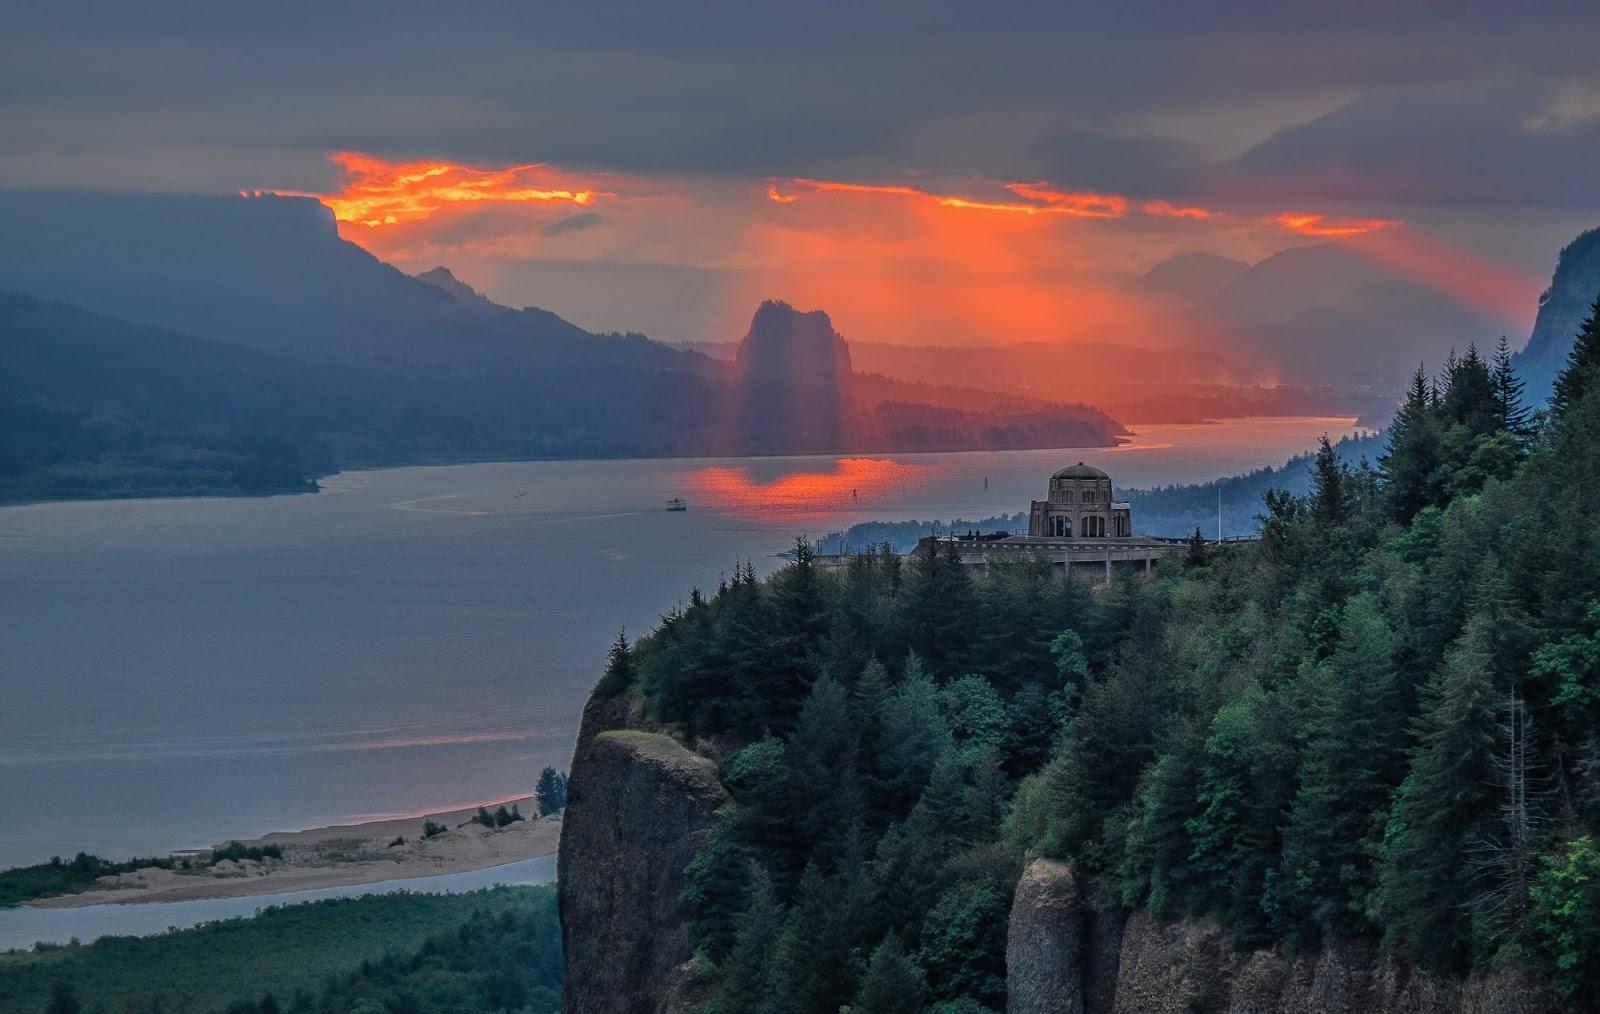 Rare Birds Of Paradise Kari LikeLikes: Sunset...